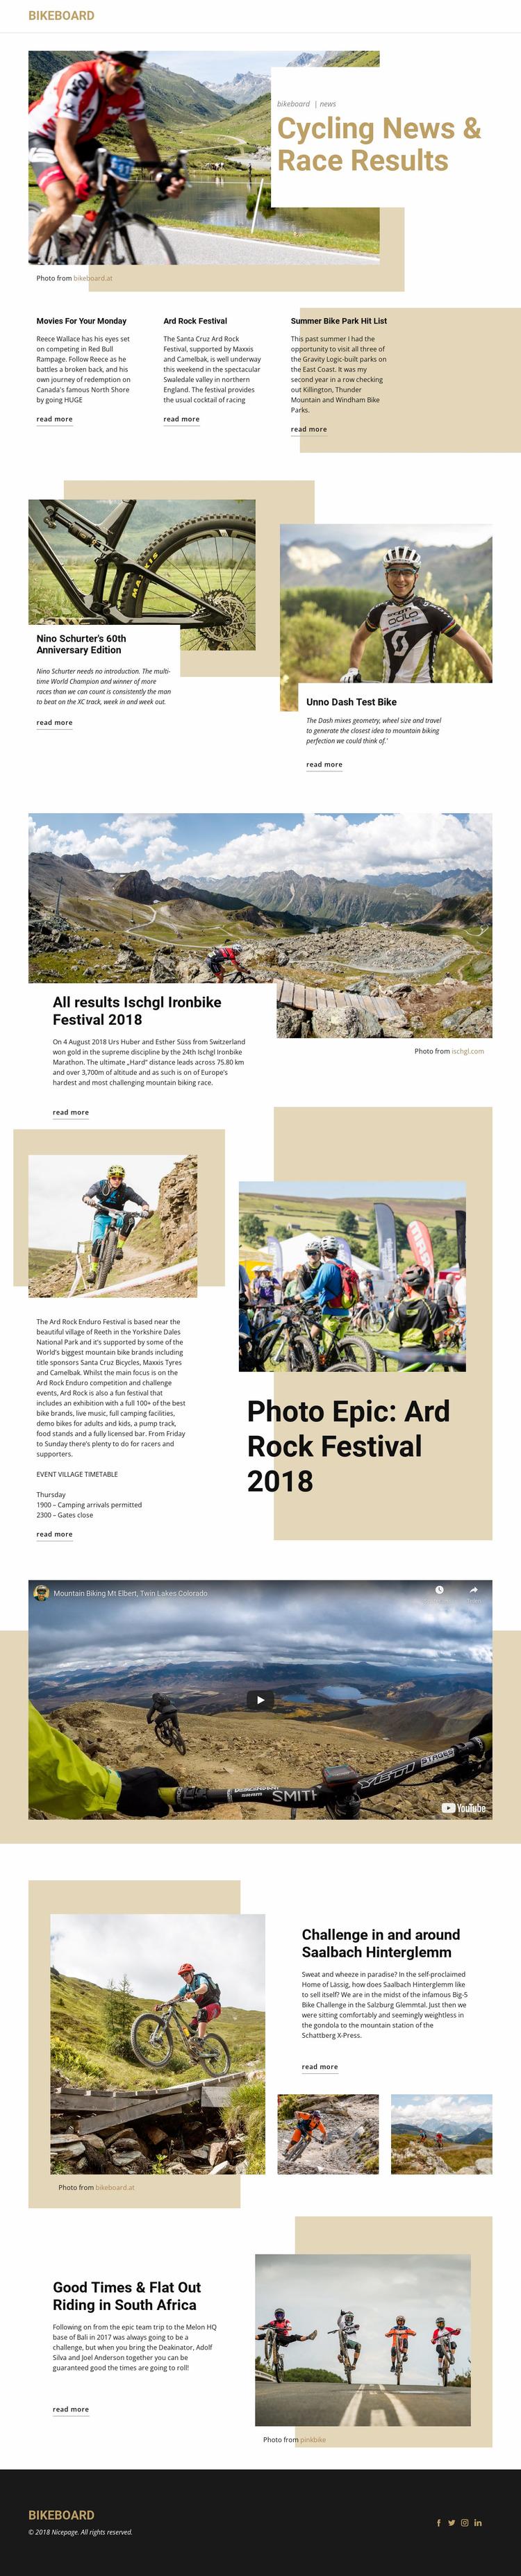 Cycling News Website Mockup